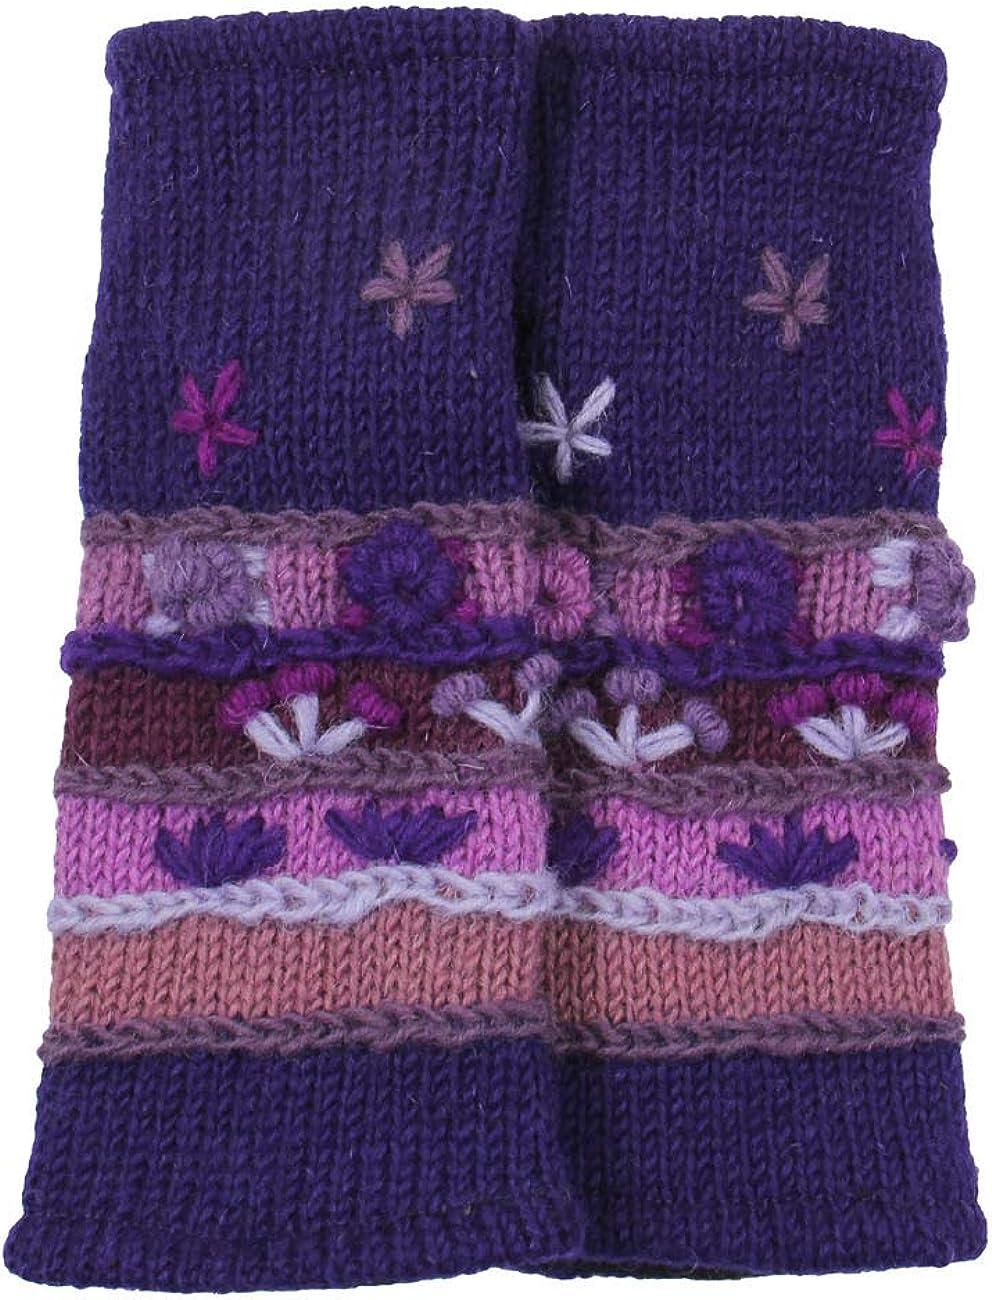 RW Hand Knit 100% Wool Fleece Lined Hand Warmer/Glove